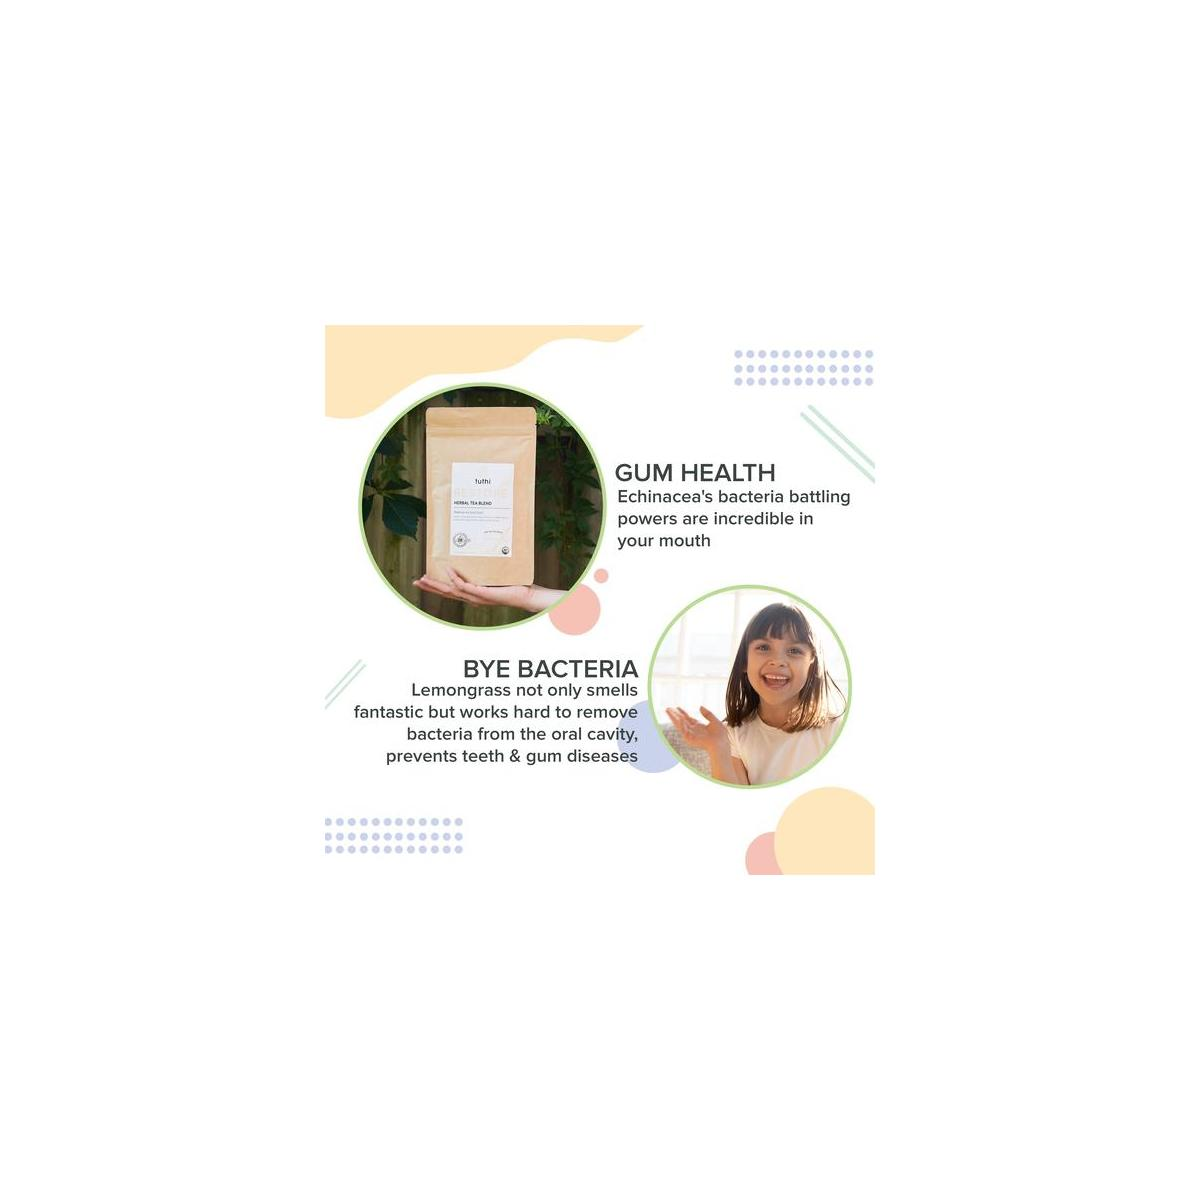 Organic Oral Care Tea - Natural Treatment for Receding Gums, Fresh Breath, Healthy Mouth - Dentist Formulated for Teeth